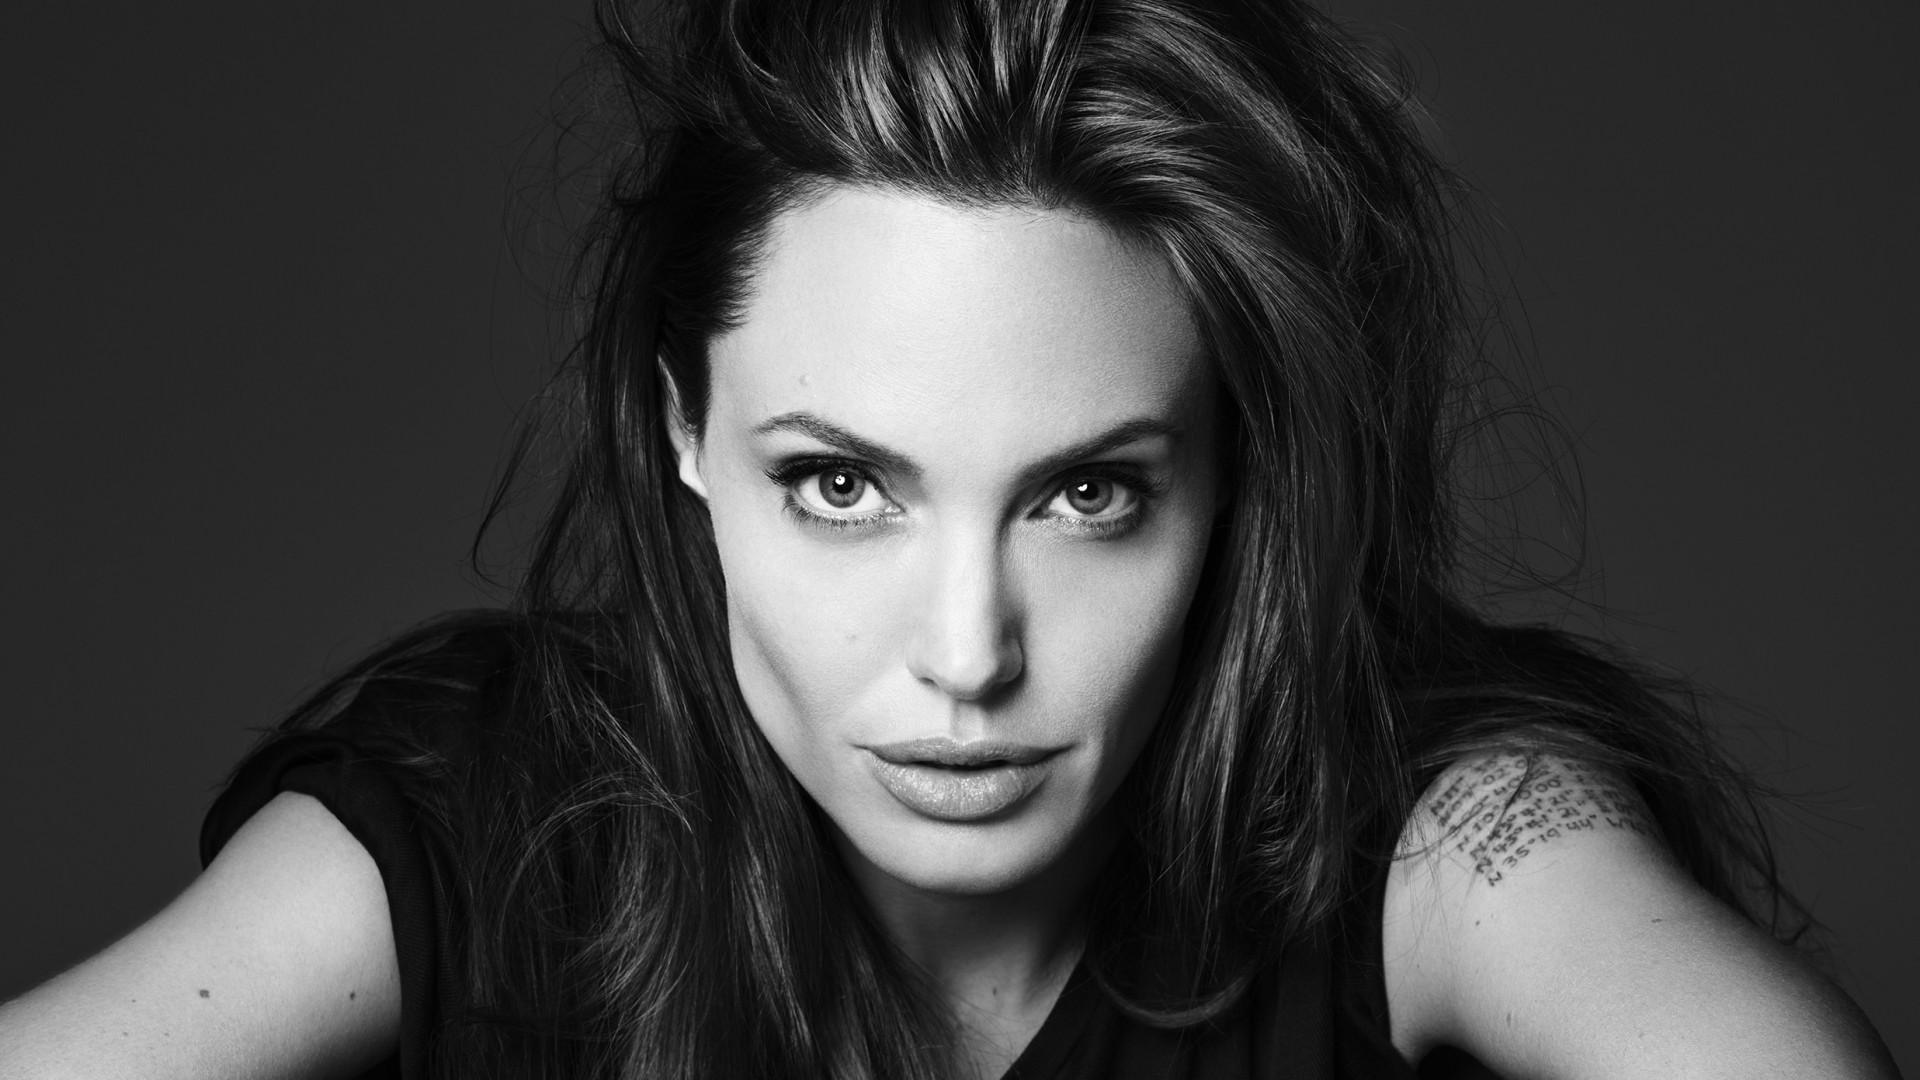 Angelina Jolie Hd Wallpapers: Angelina Jolie Wallpaper ·① WallpaperTag